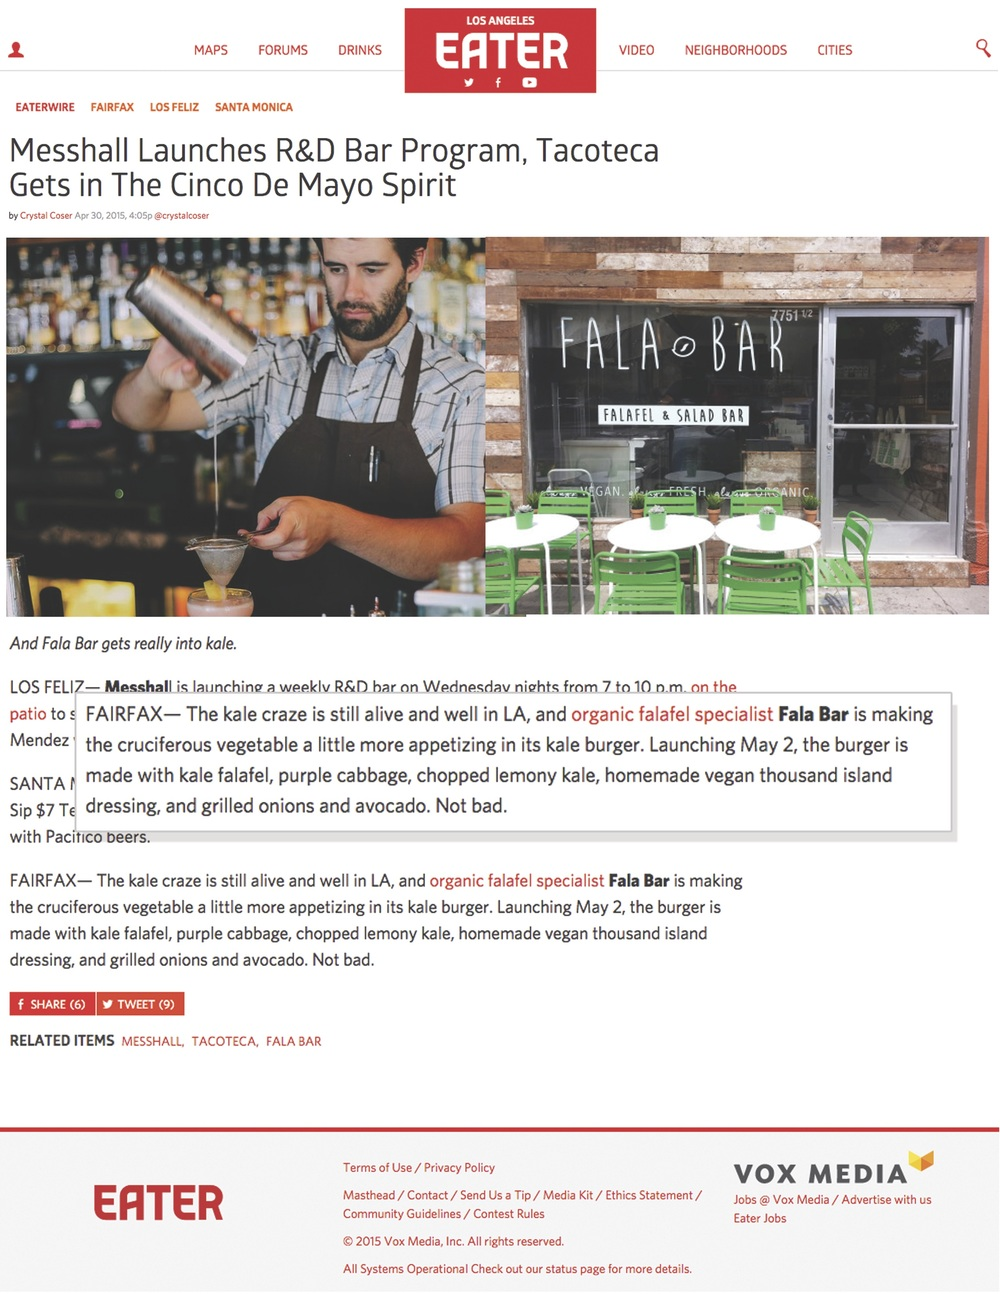 Report about Fala Bar